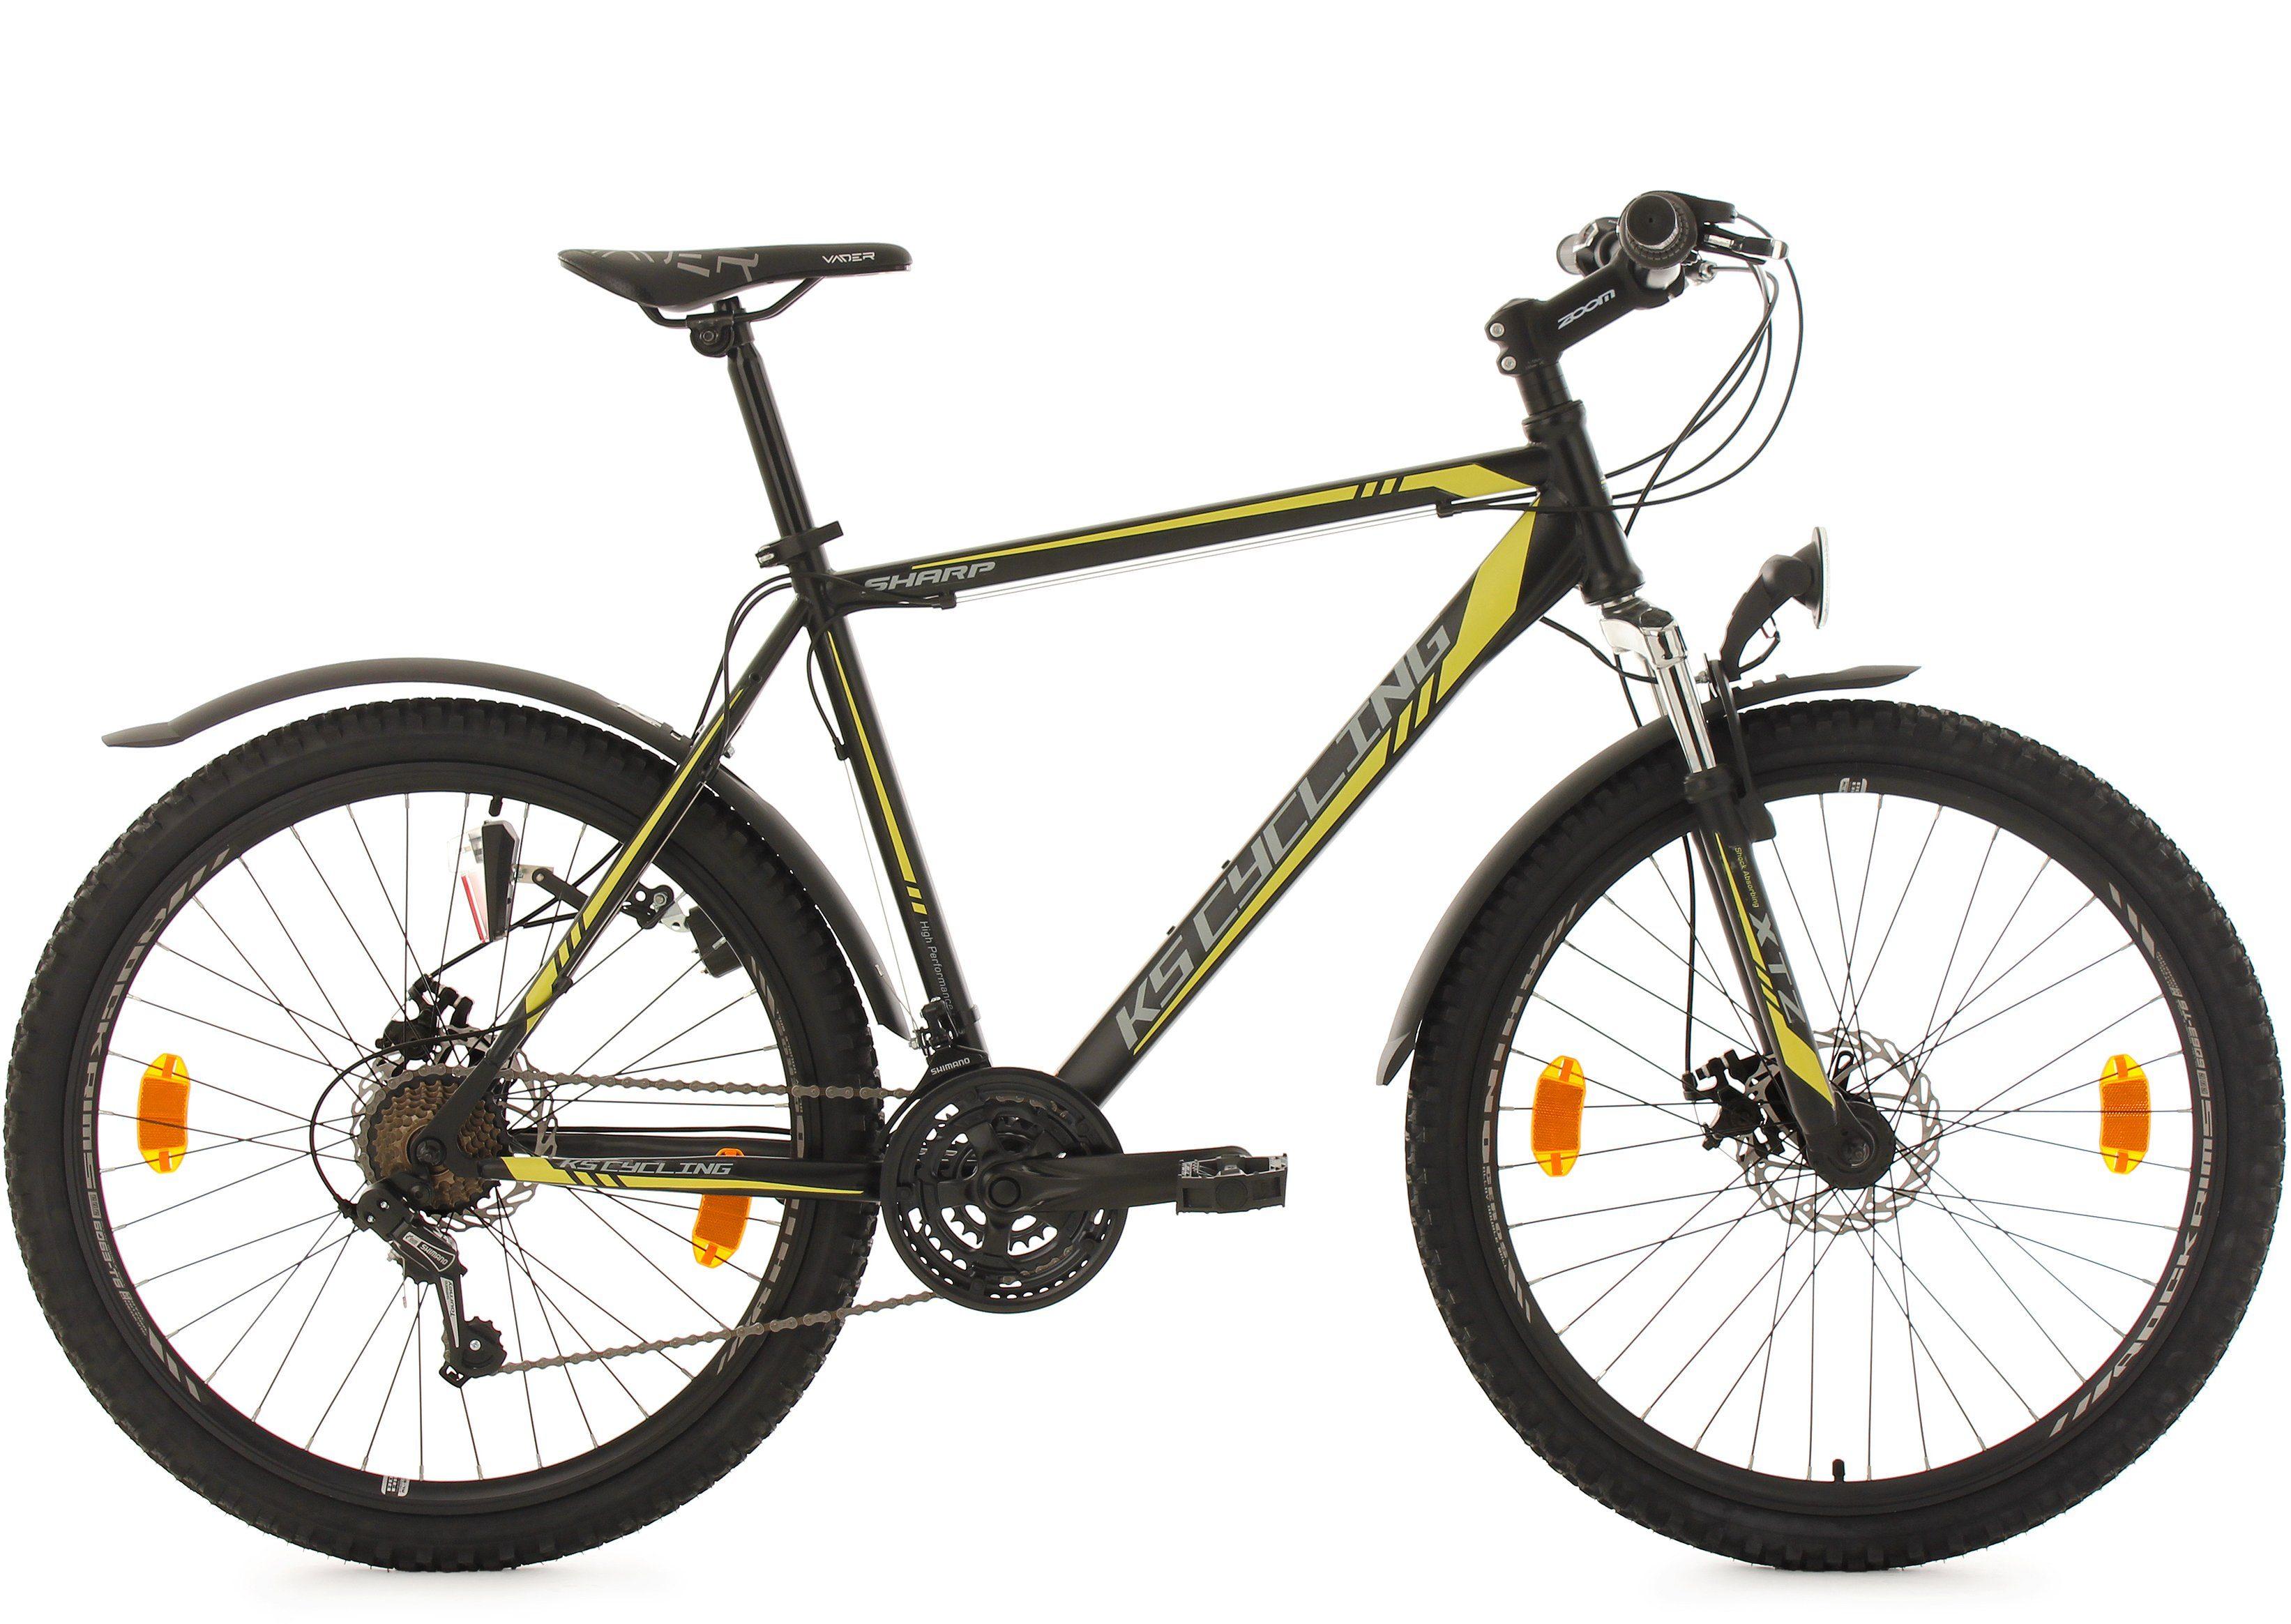 KS Cycling Herren Hardtail-MTB, 26 Zoll, 21 Gang-Shimano Tourney Kettensch, schwarz-gelb, »Sharp«